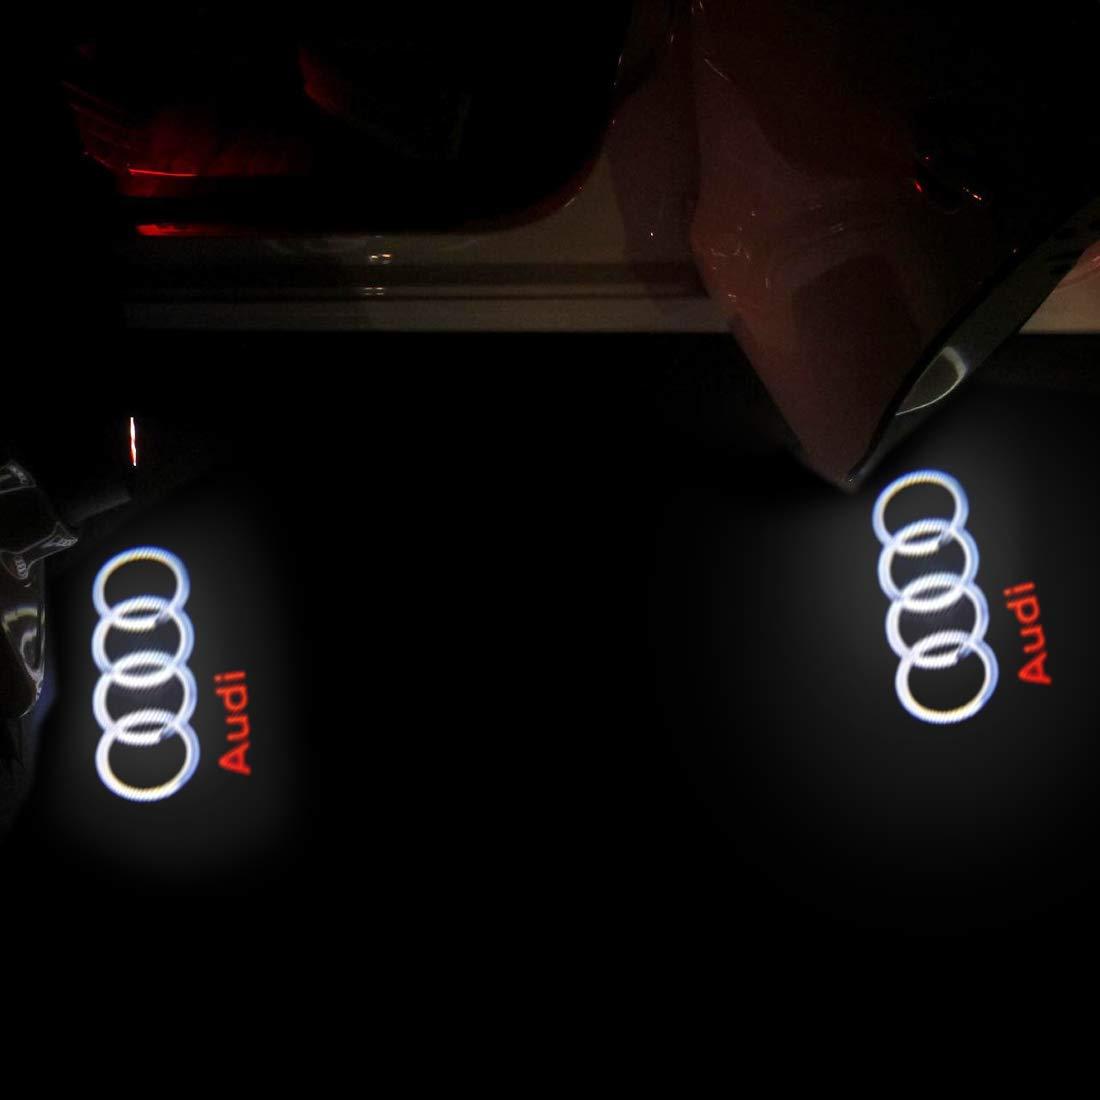 Oheealt Audi Car Accessories Door Logo Led Light Car Door Ghost Shadow Projector Welcome Lamp Symbol Emblem Step Courtesy Lights Ground Kit for for Audi A1 A3 A4 A5 A6 A7 A8 Q3 Q7 R8 TT 2 Pack